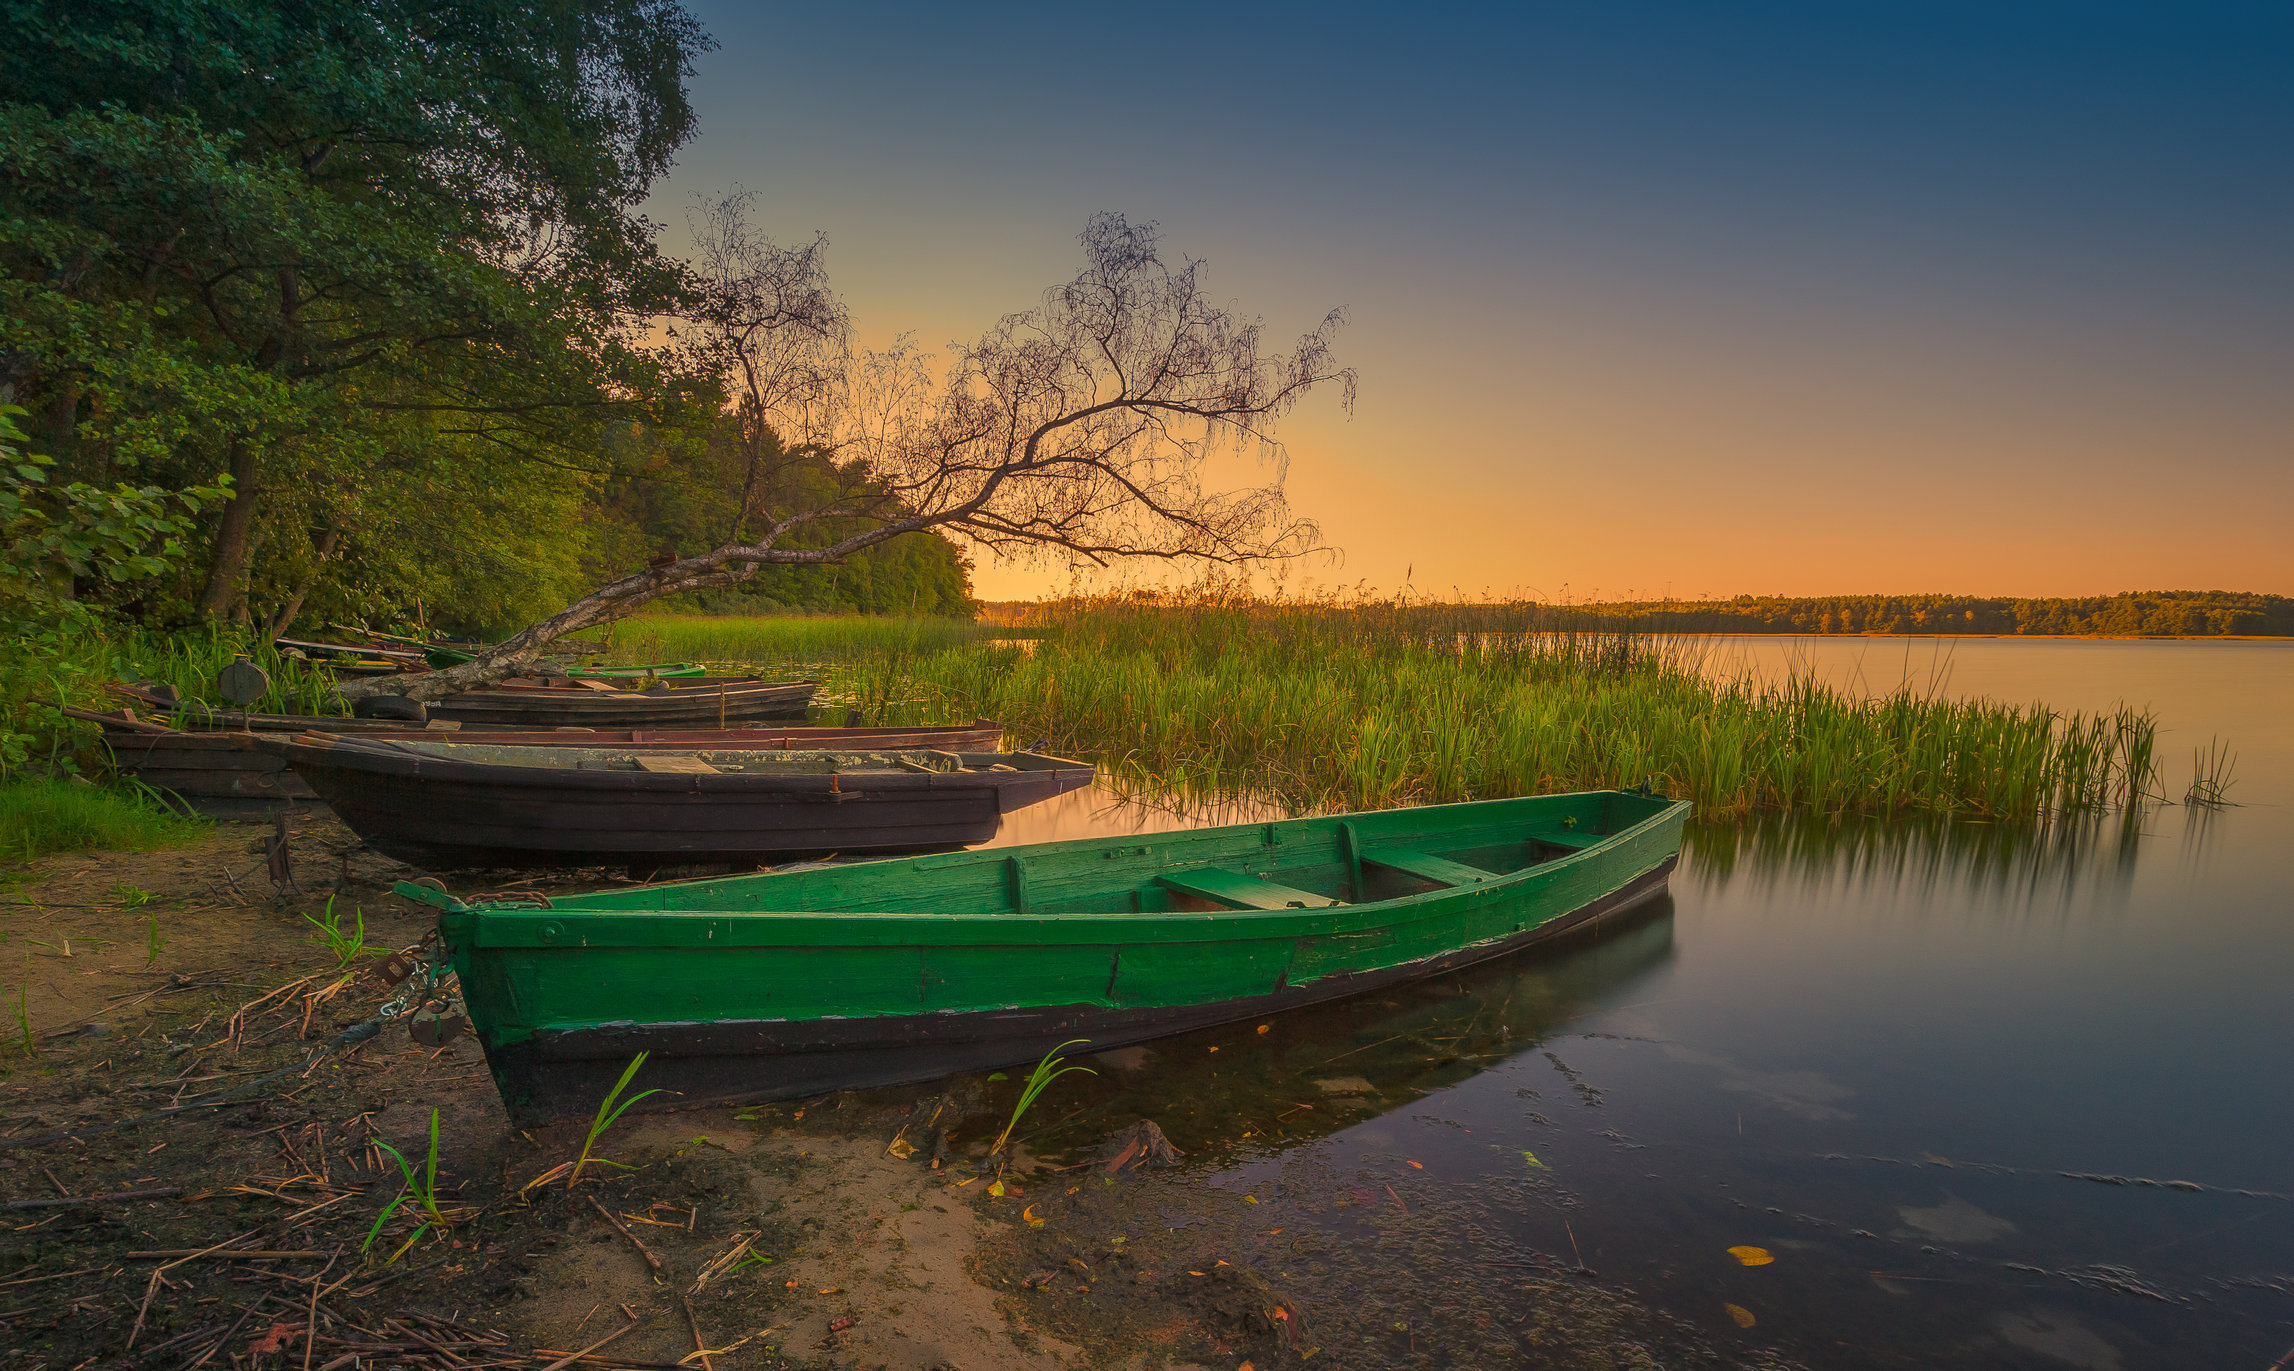 Wilczkowo Lake